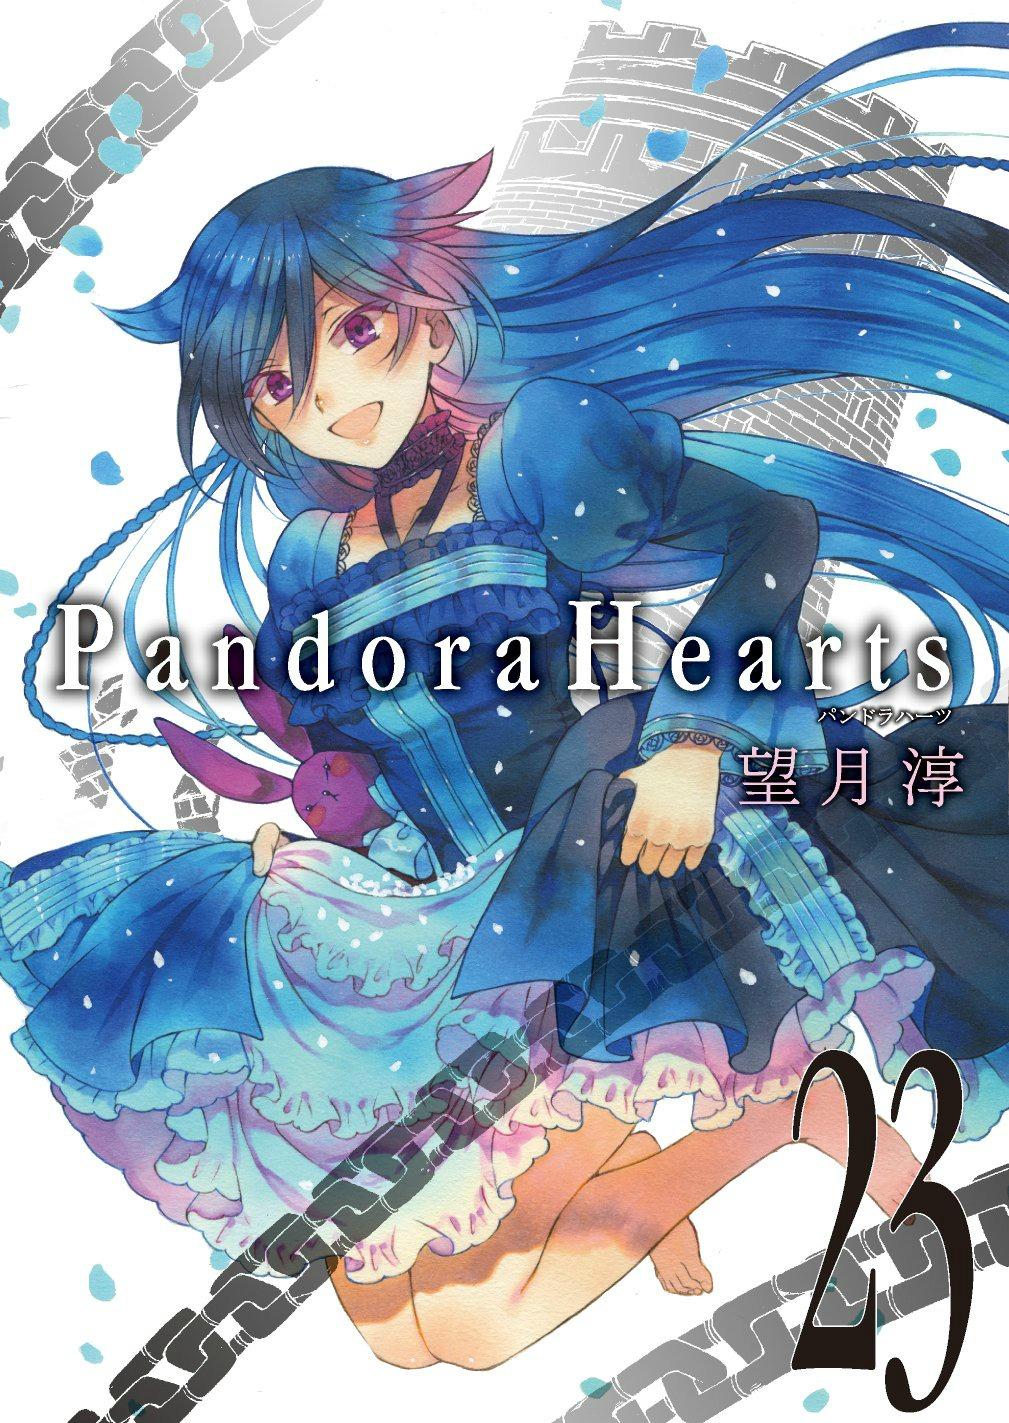 pandora hearts chains of destiny